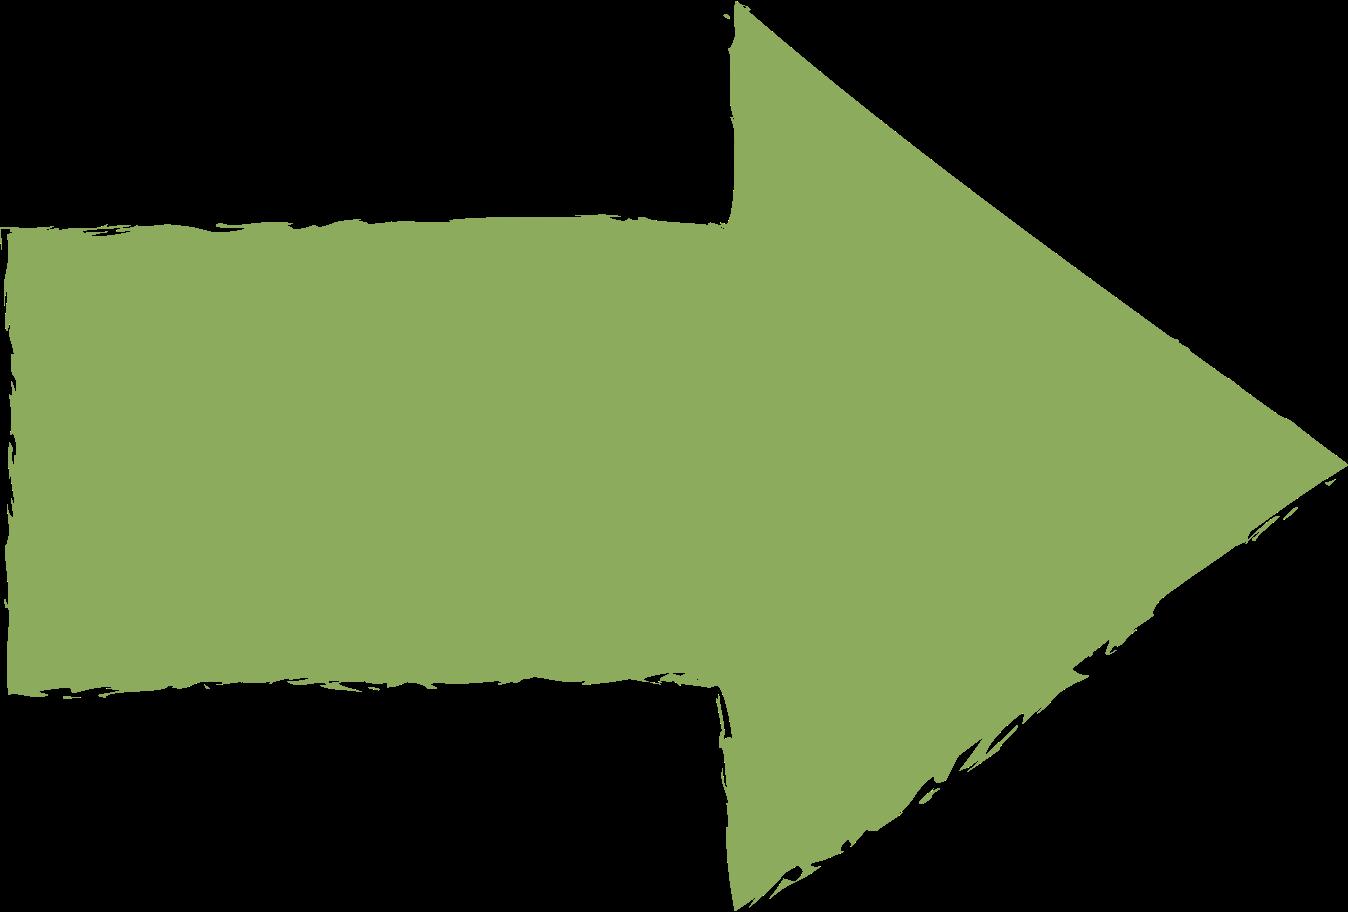 arrow-dark-green Clipart illustration in PNG, SVG